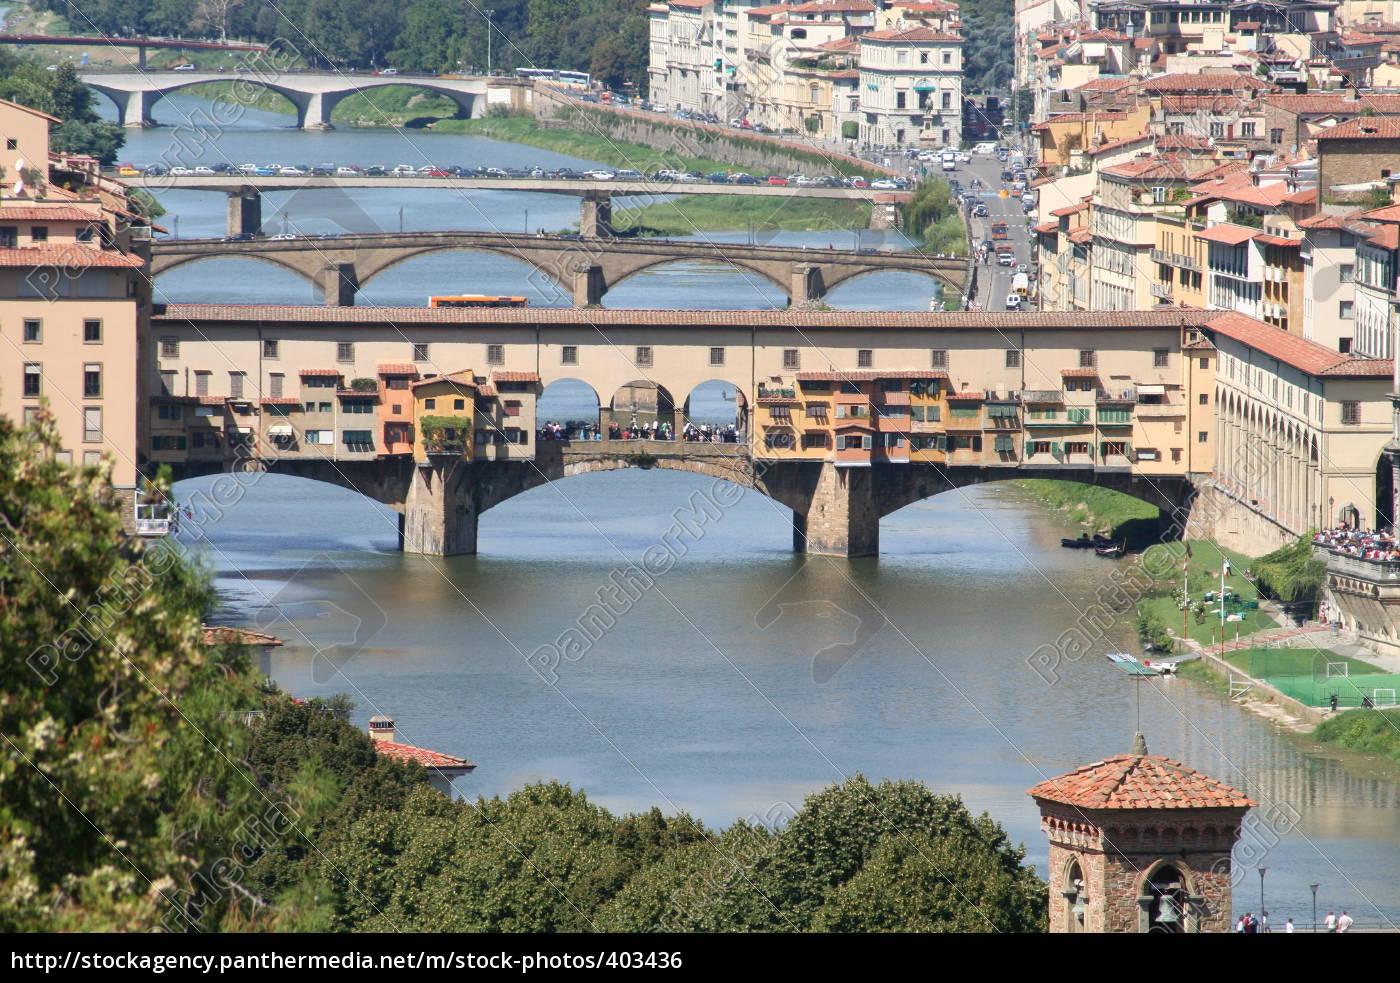 ponte, vecchio - 403436